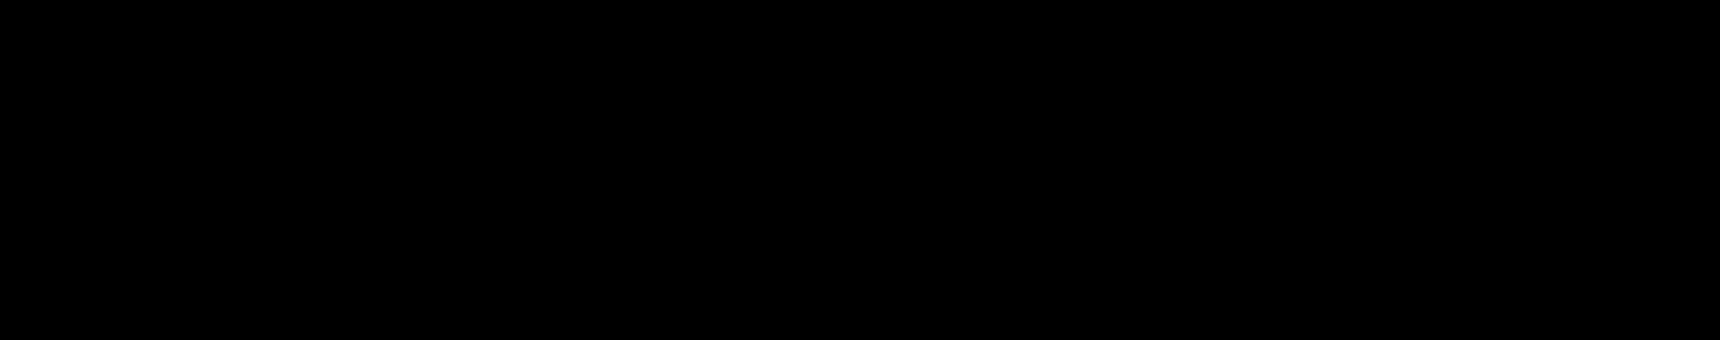 Black Shanty Off 1720x340